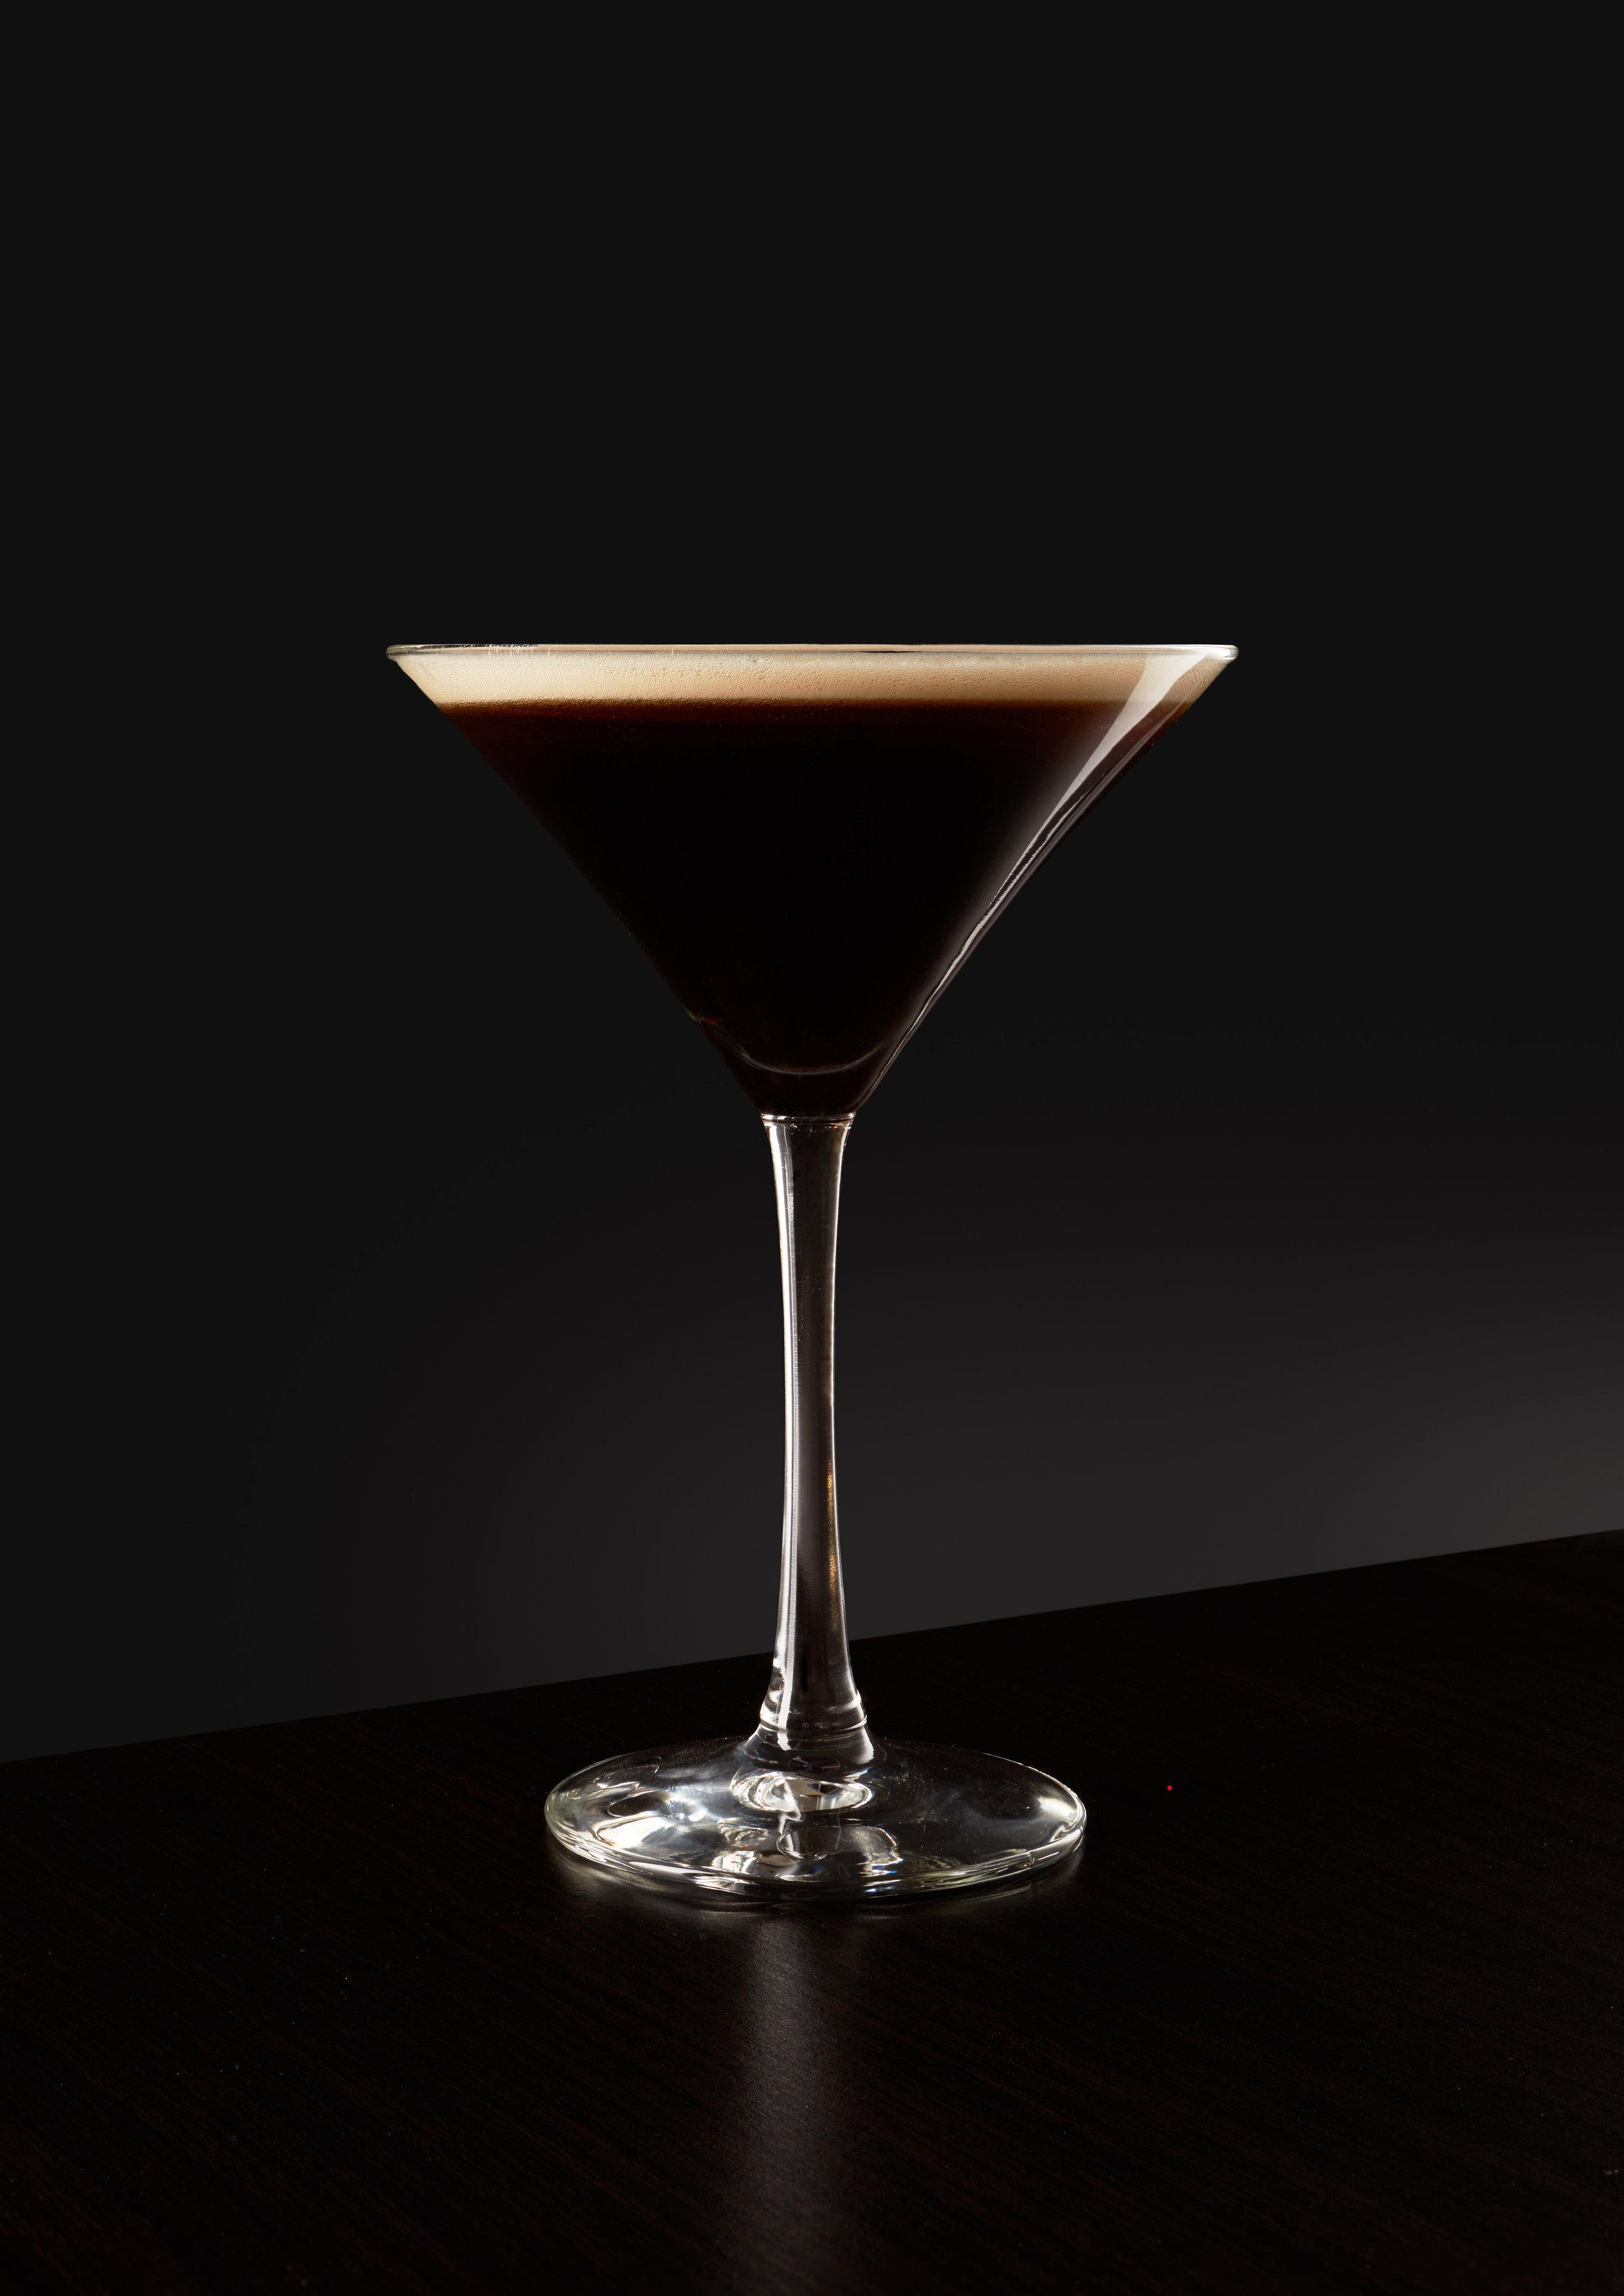 The Toasted Porter Martini